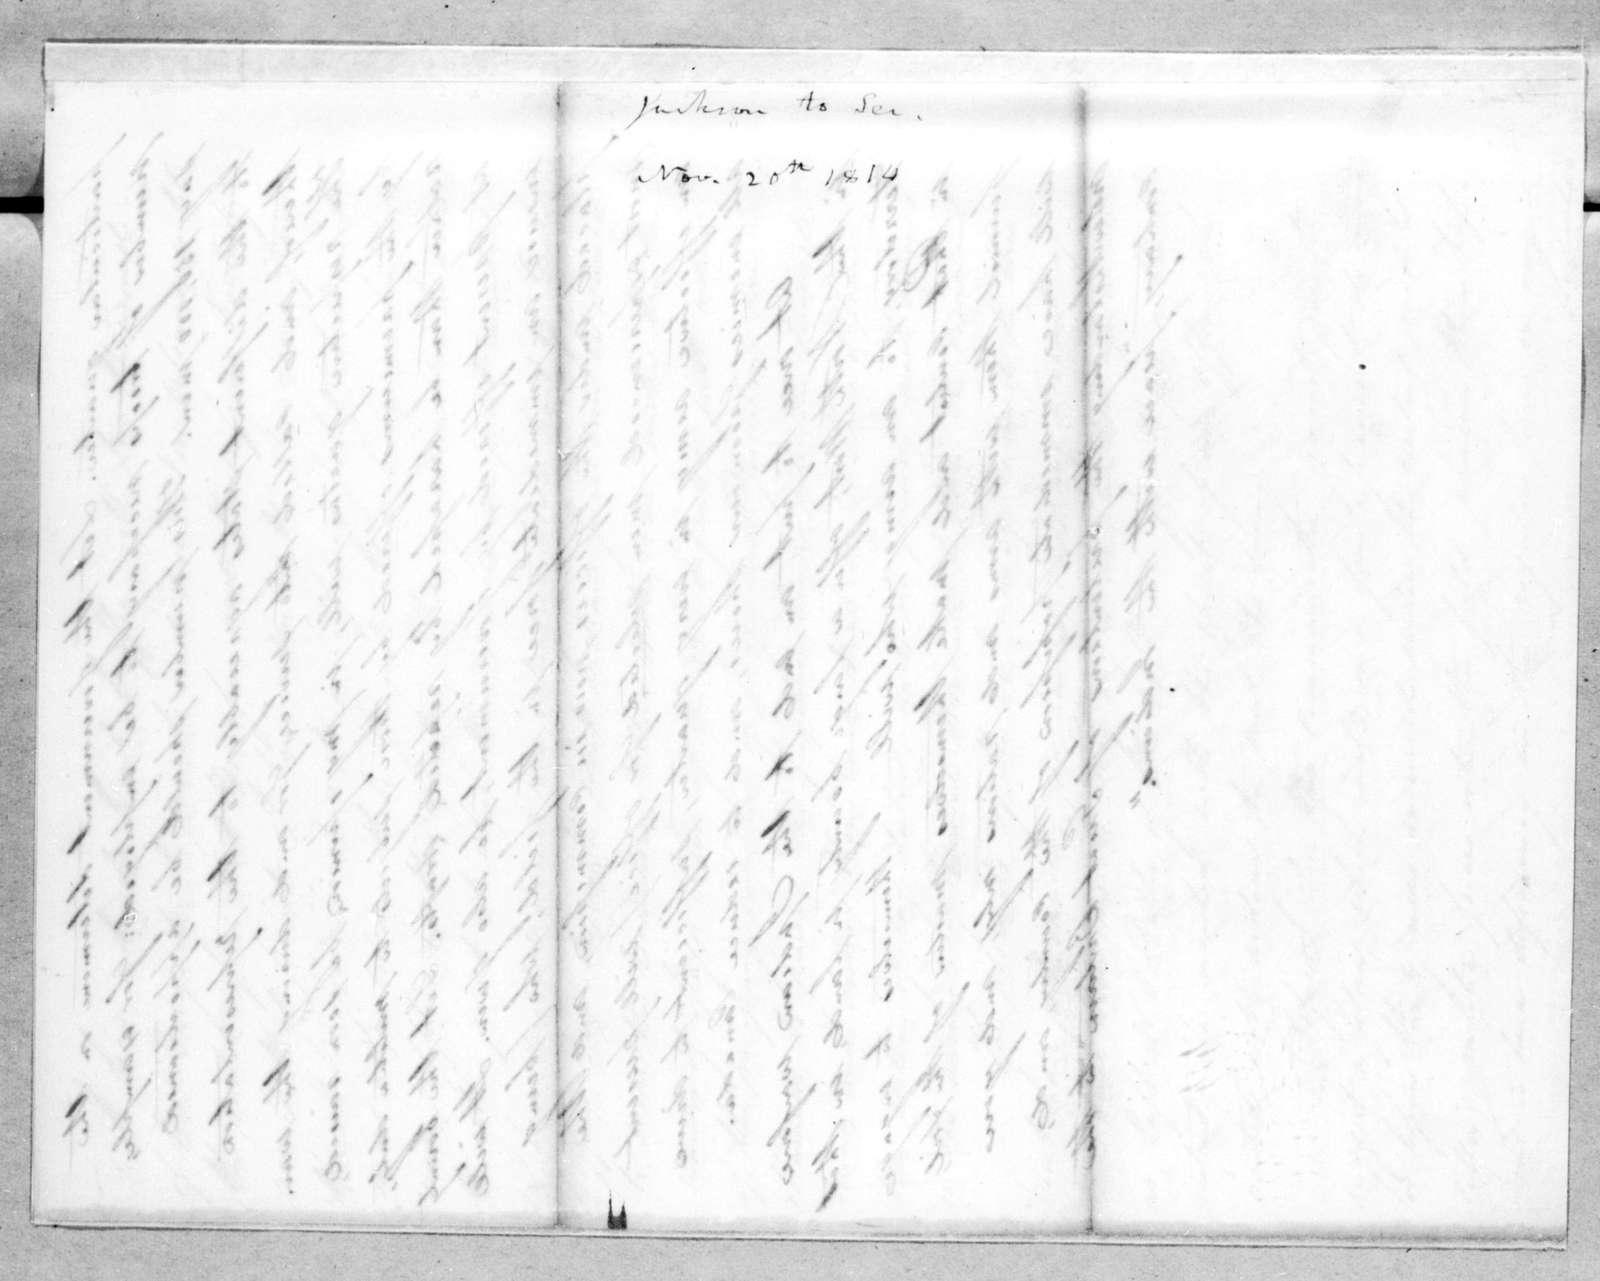 Andrew Jackson, November 20, 1814